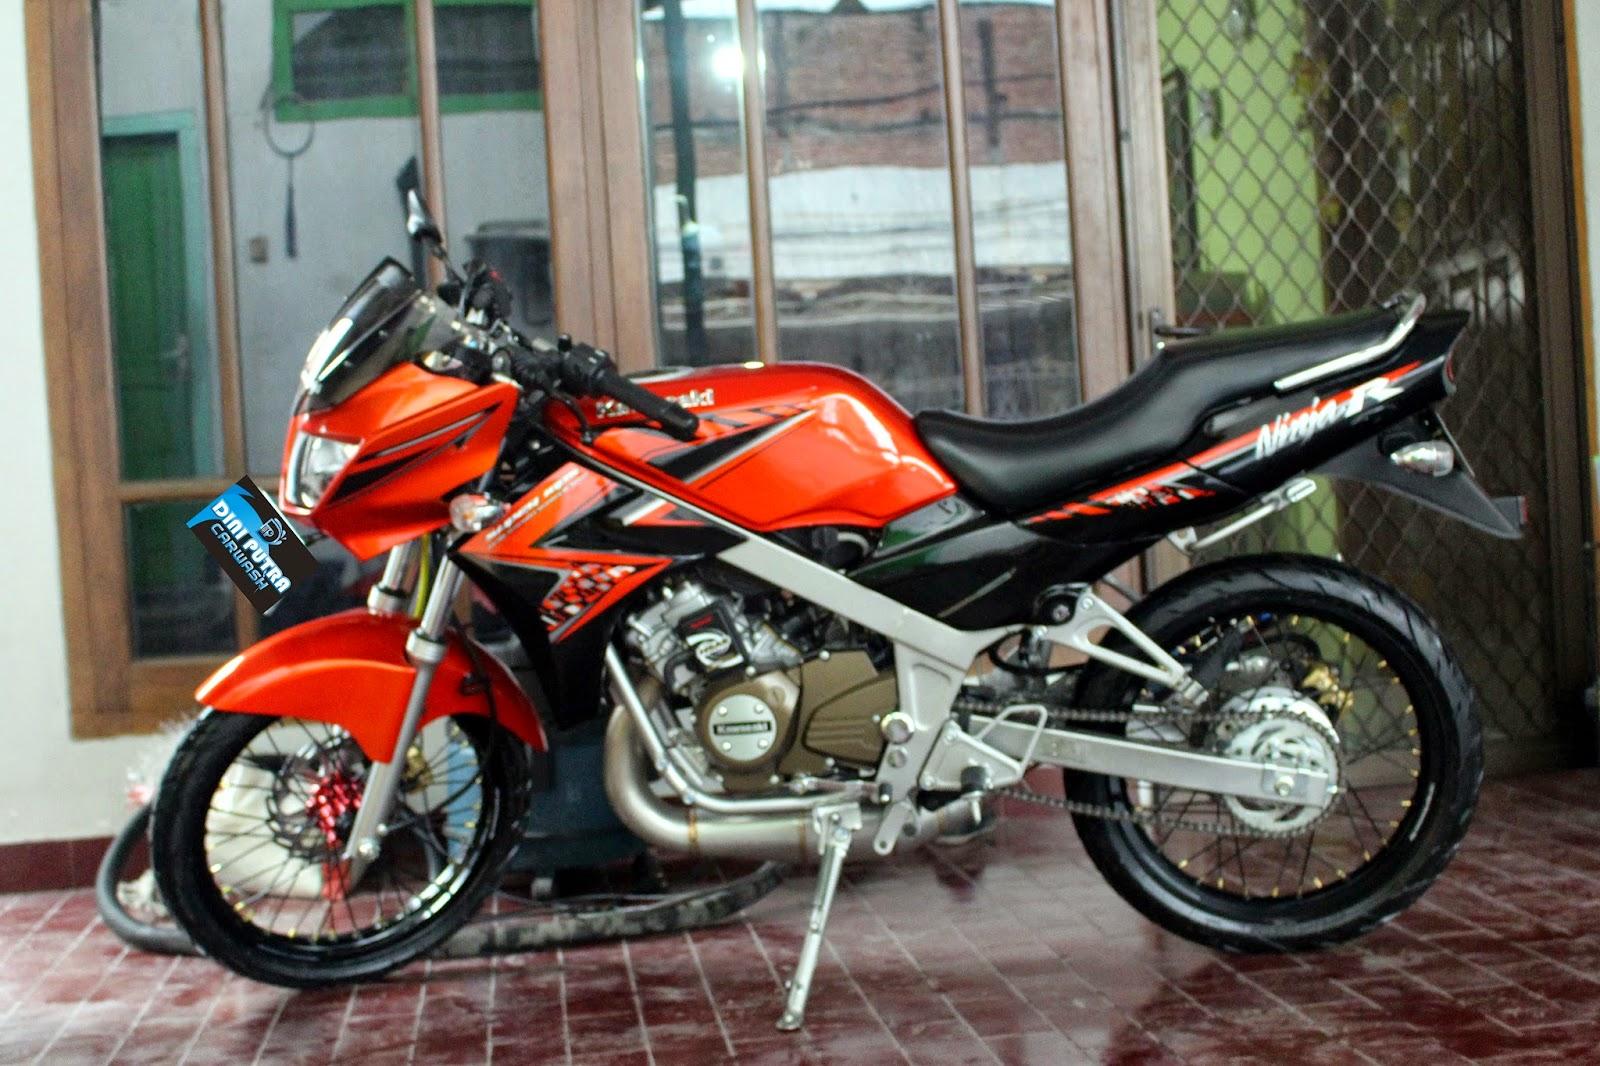 Kawasaki Ninja 150R Detailing Project Dini Putra carwash ngronggo Kediri